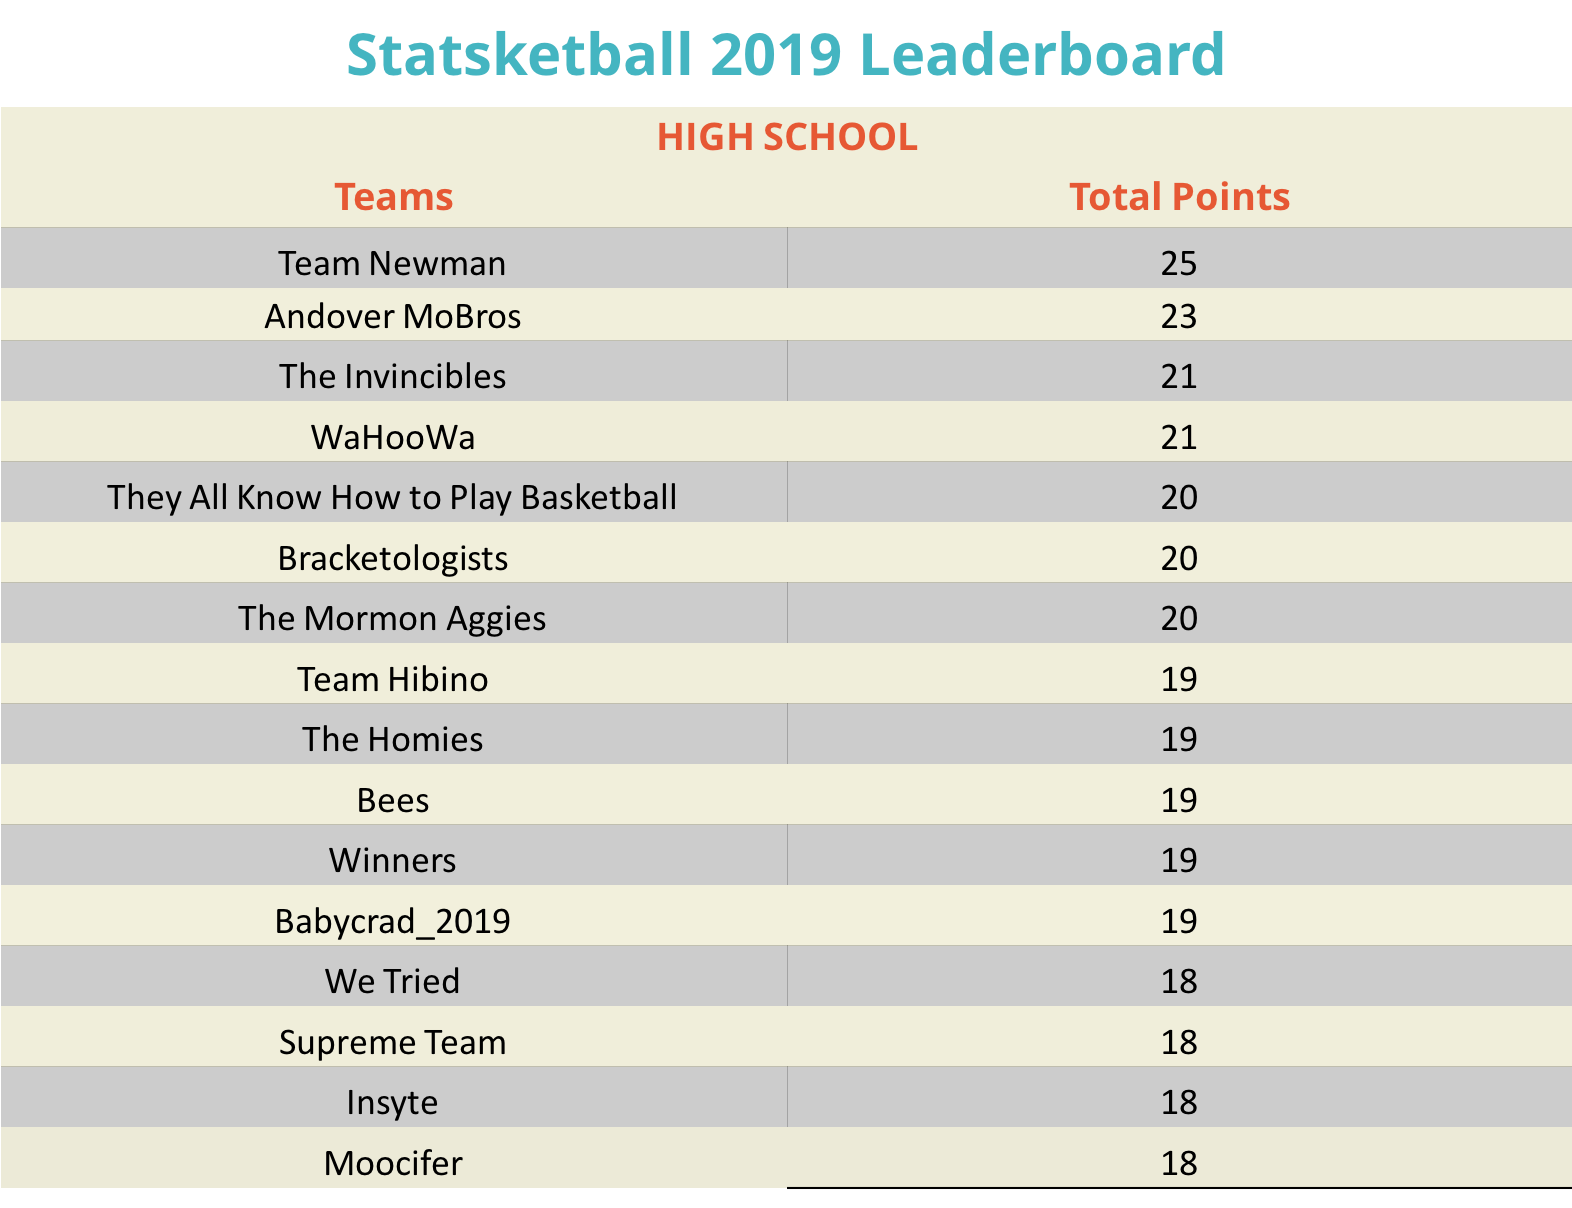 HS Leader032519_Statsketball